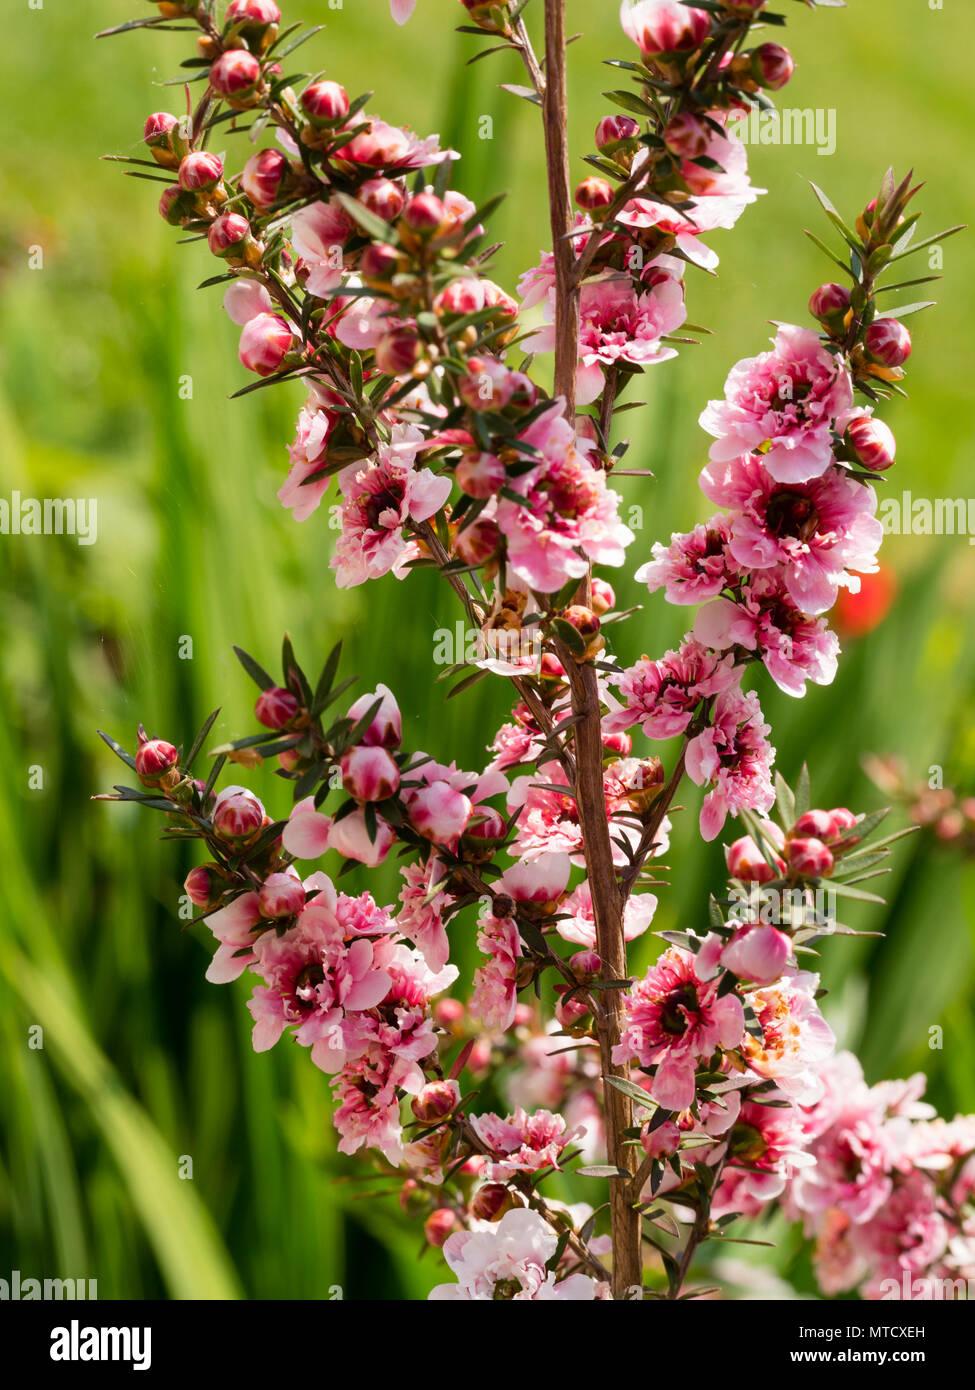 Doppelzimmer Rosa Formular der Neuseeland Manuka oder Teebaum, Leptospermum scoparium, Blüte im Frühsommer Stockbild